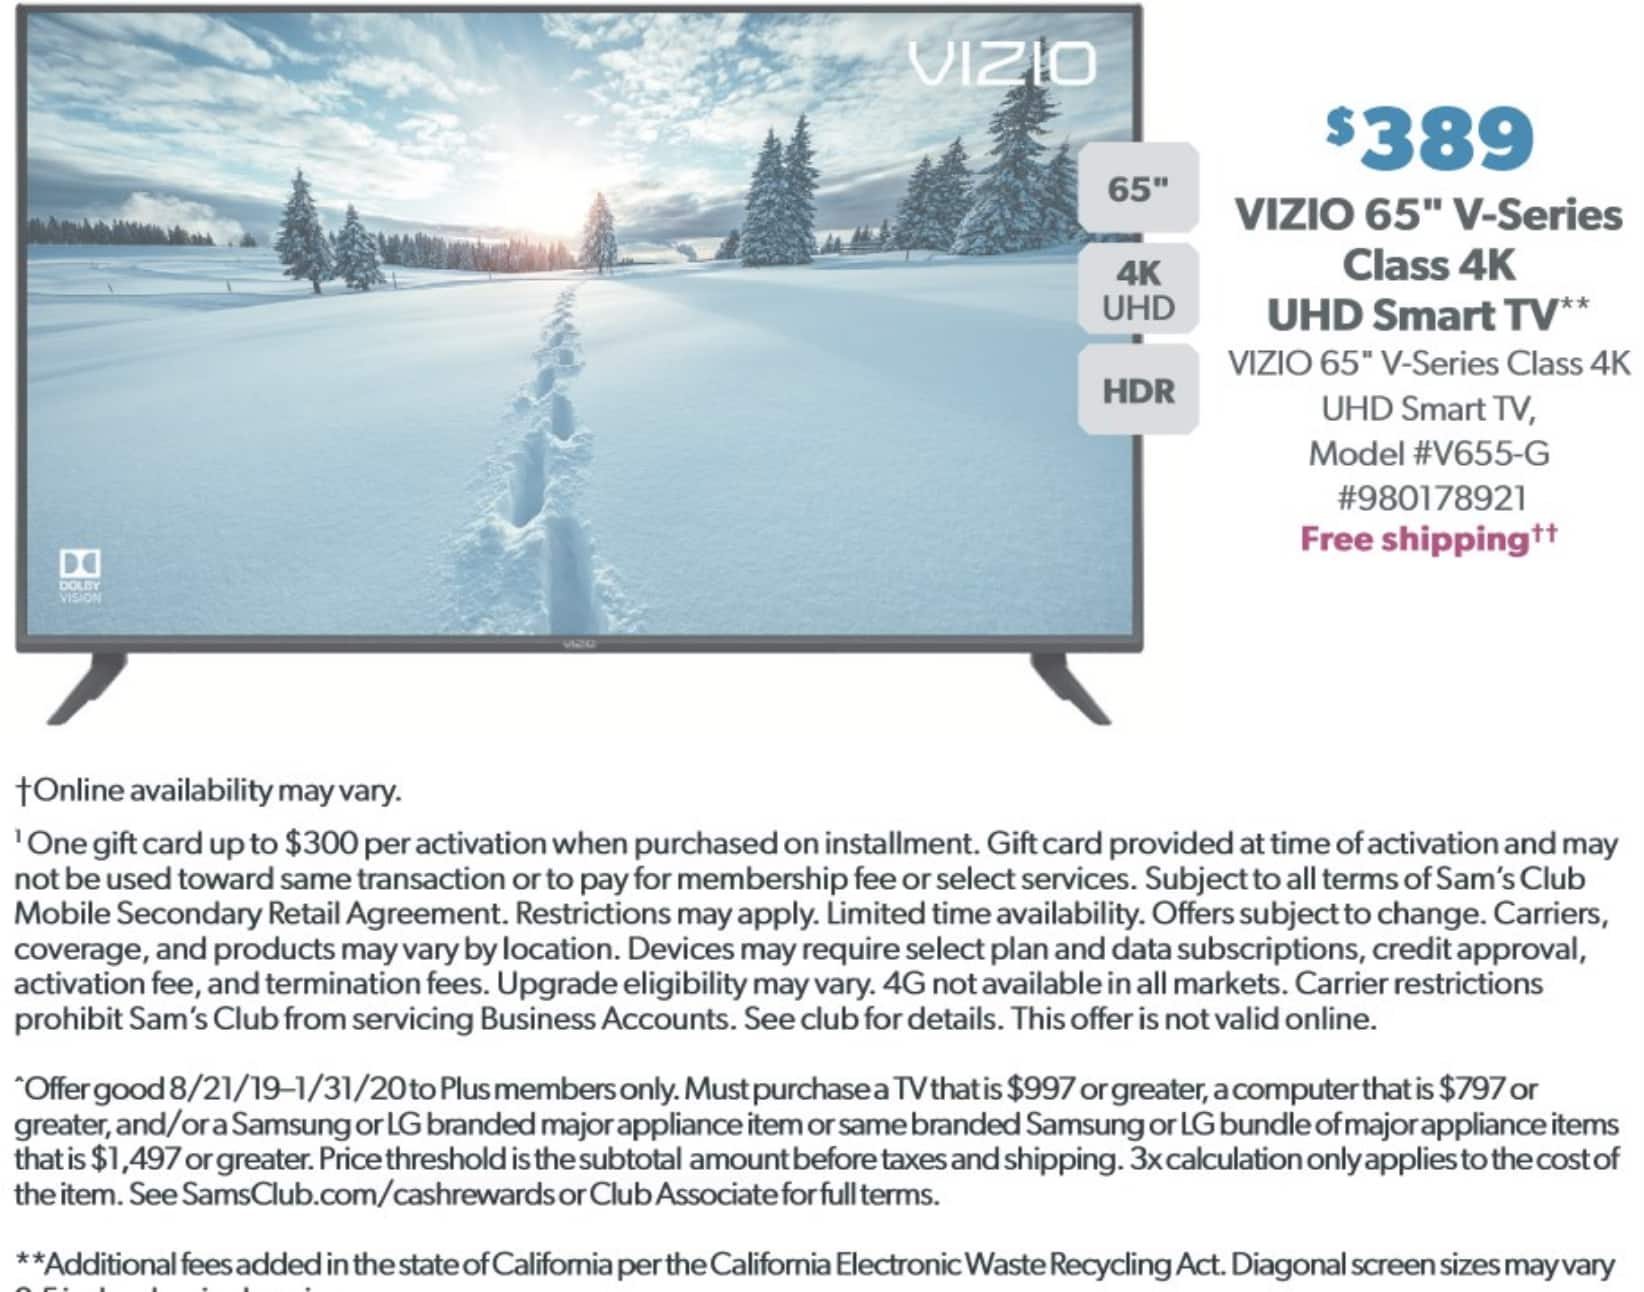 "Sam's Club VIZIO V-Series™ 65"" Class 4K HDR Smart TV - V655-G9  for $389 only on 12/14/2019"